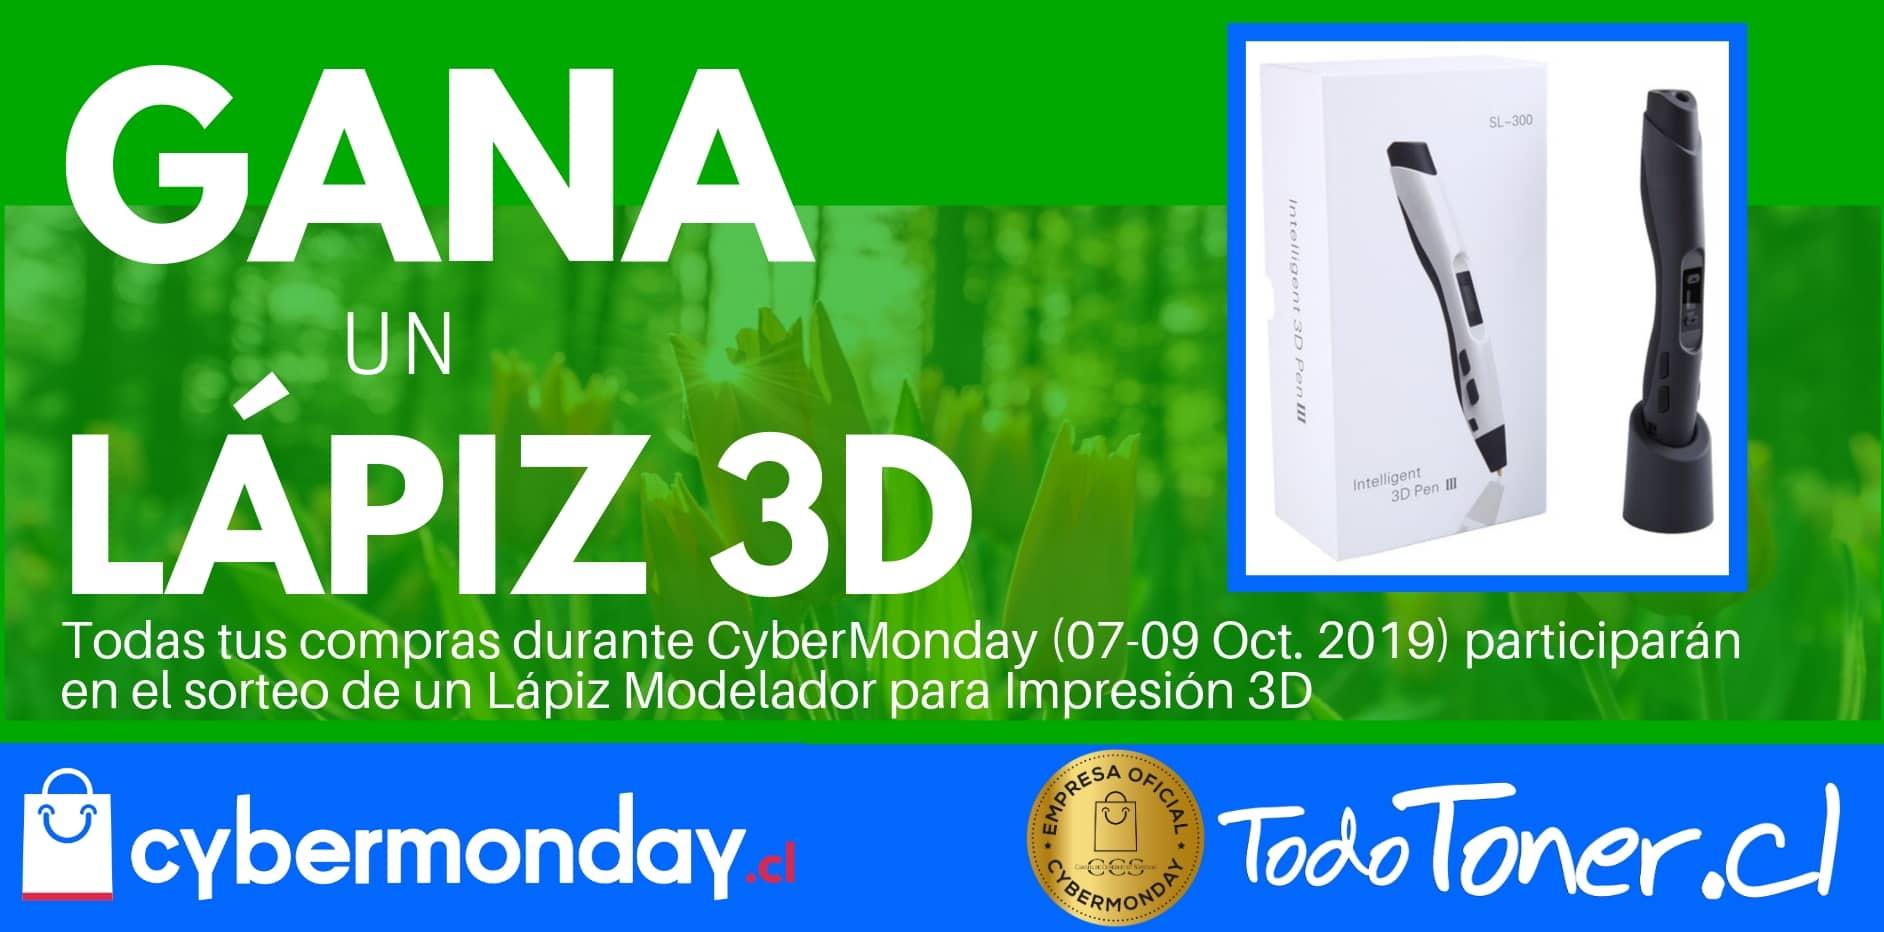 CONCURSO COMPRAS CYBER MONDAY